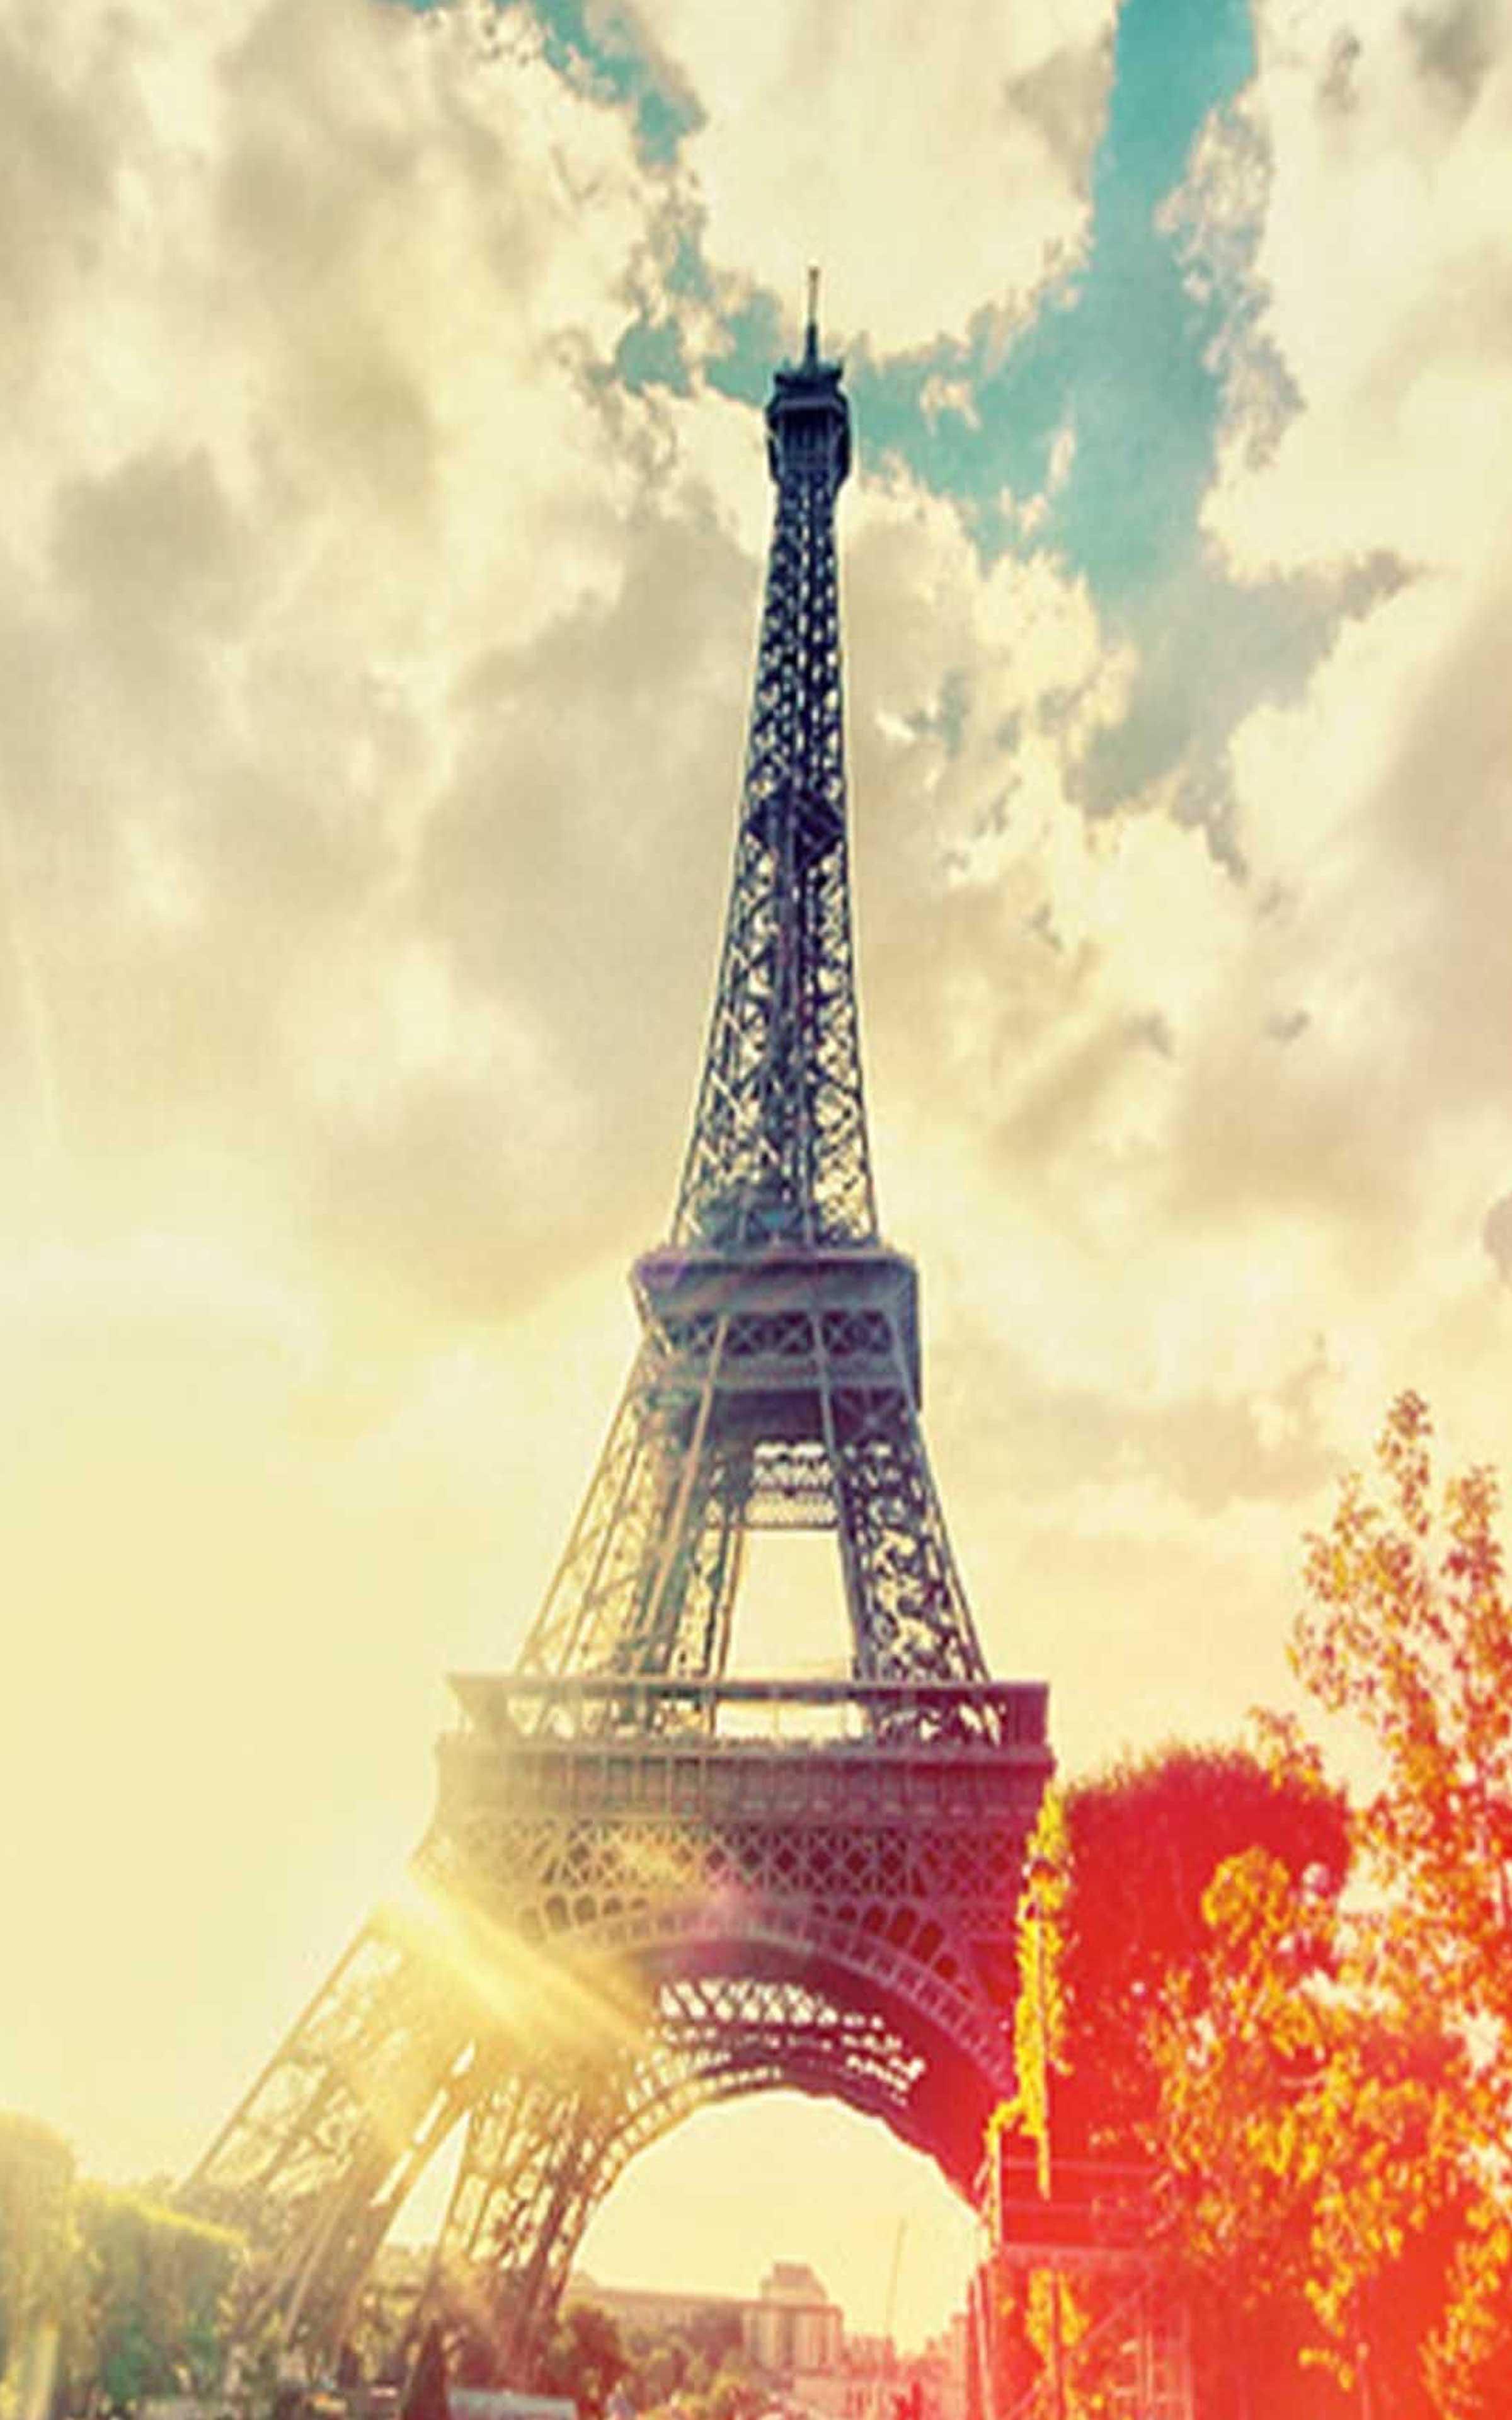 Paris Wallpaper Best Cool Paris Wallpapers For Android Apk Download